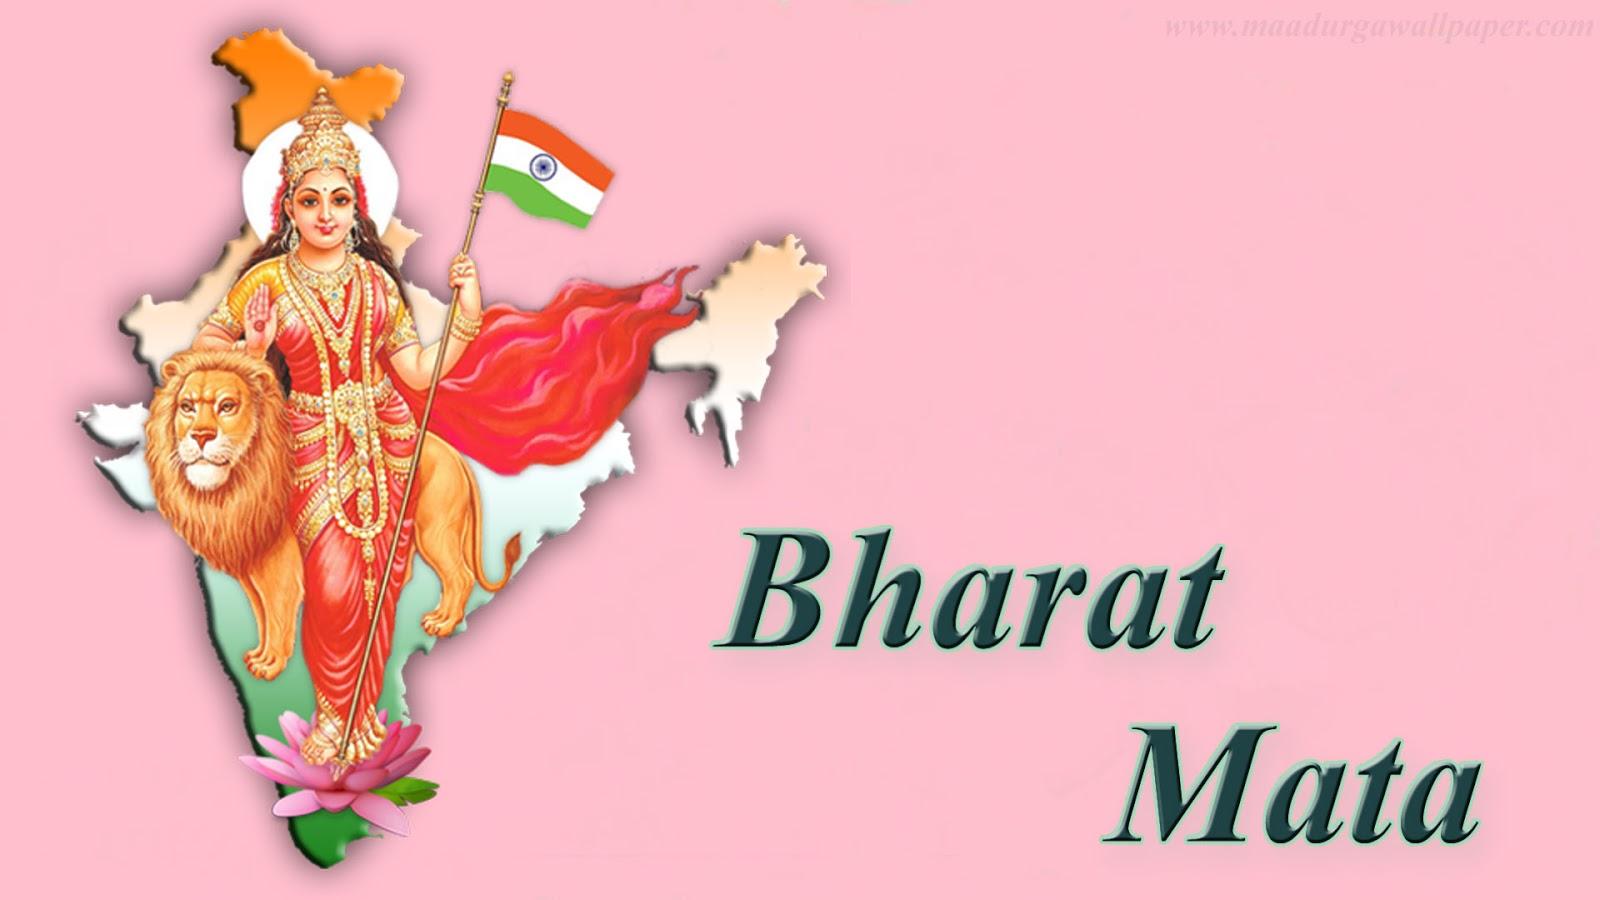 Hindu God Wallpaper Full Hd Indian God Goddess Photo Indian God Hd Photo God Picture